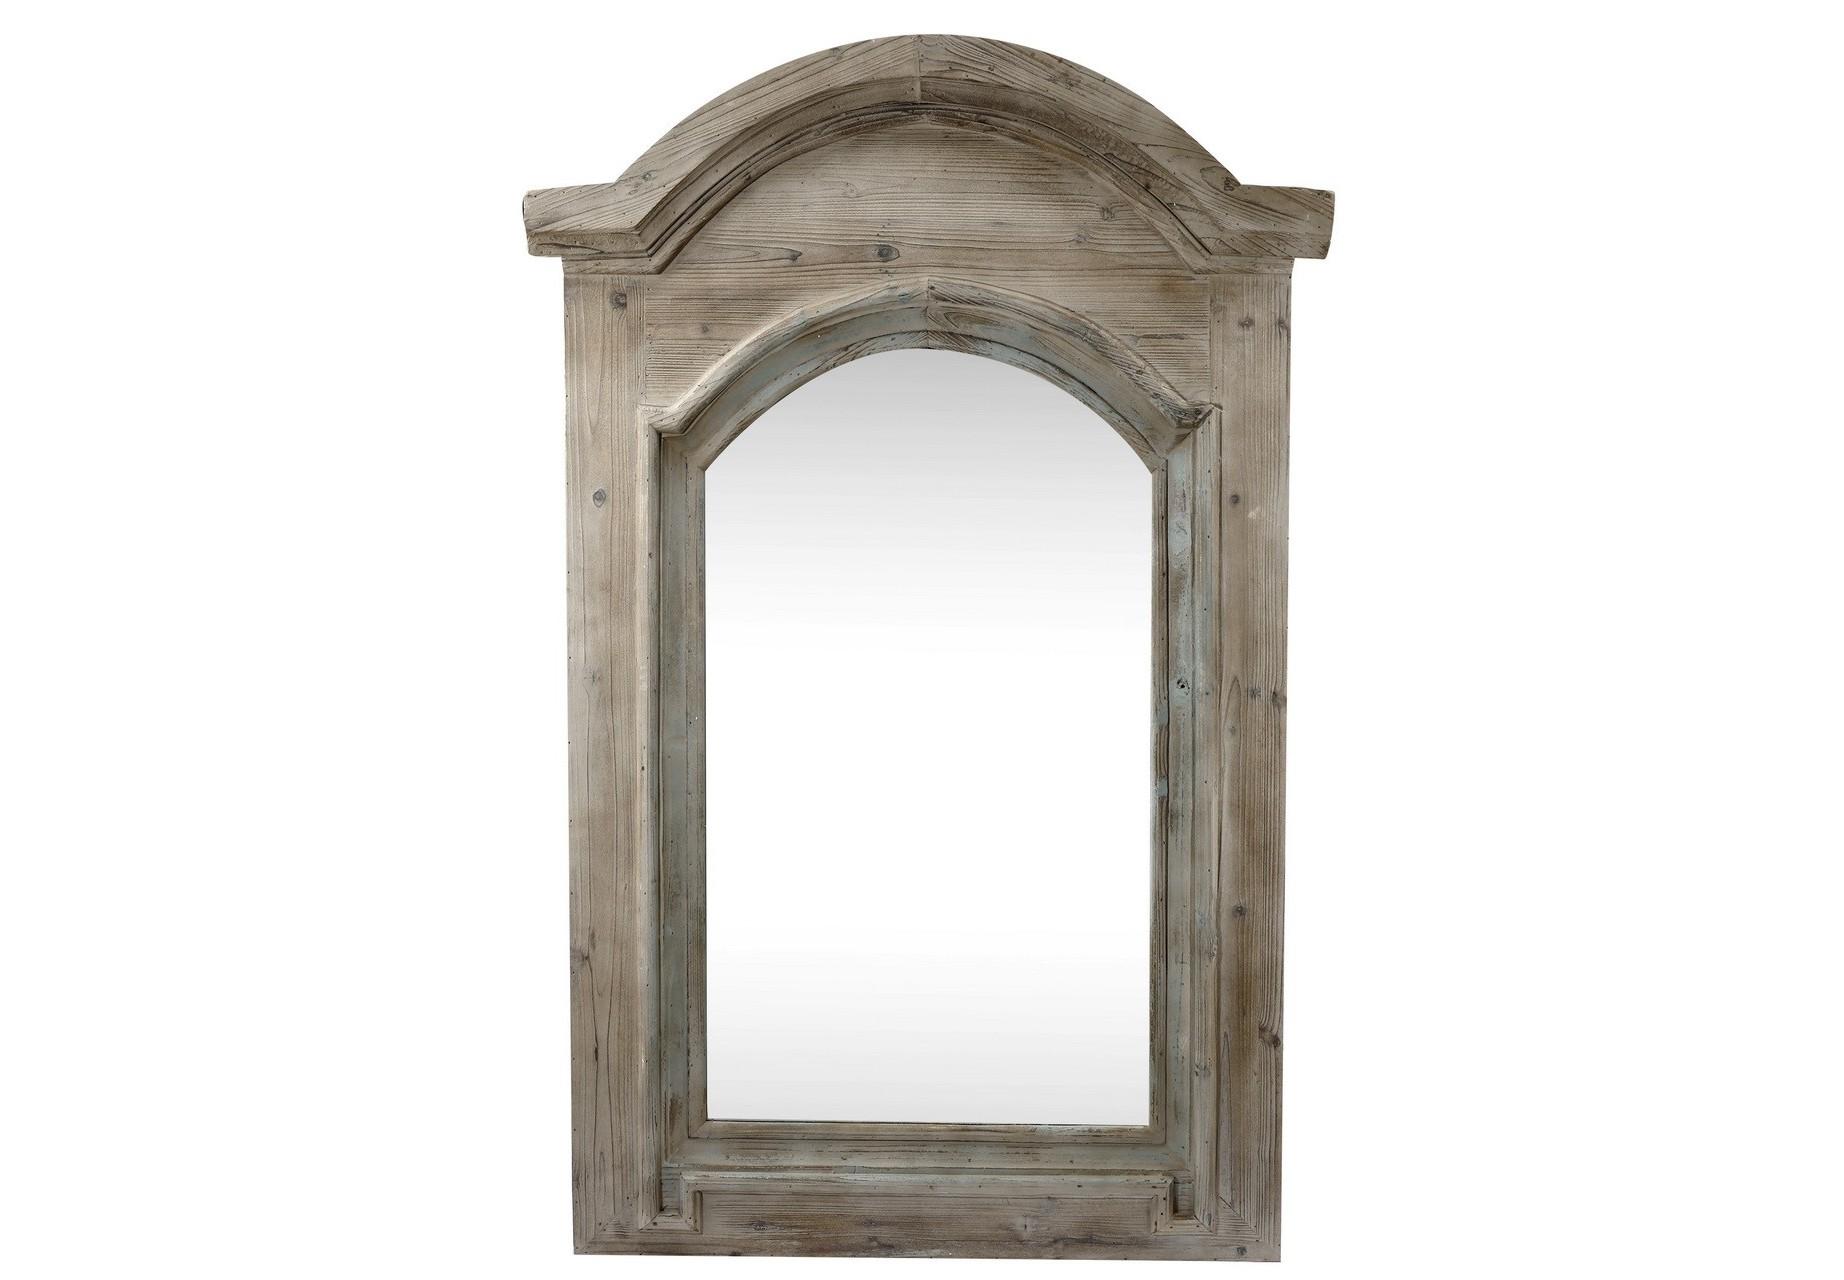 ЗеркалоНастенные зеркала<br><br><br>Material: Дерево<br>Ширина см: 98<br>Высота см: 152<br>Глубина см: 8